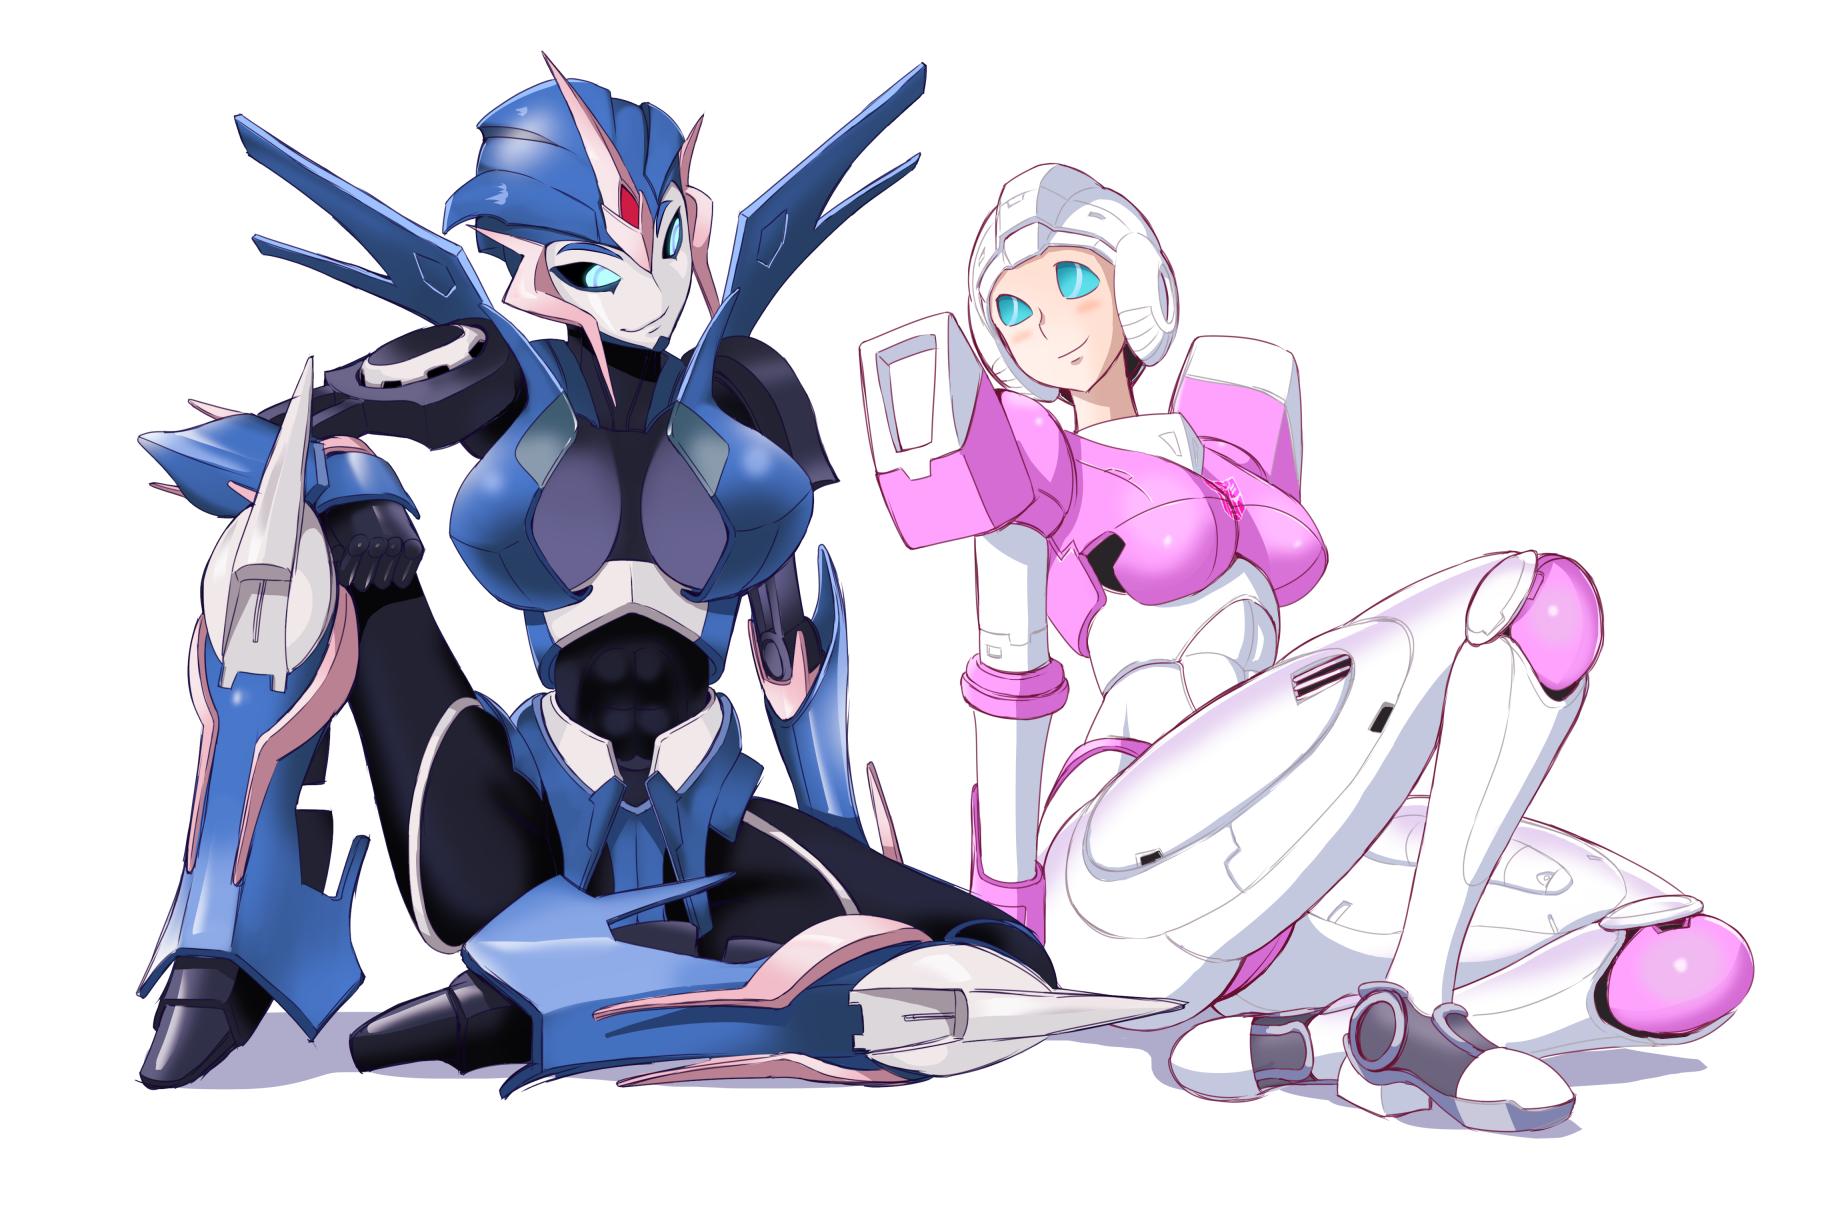 Hot nude transformer girls